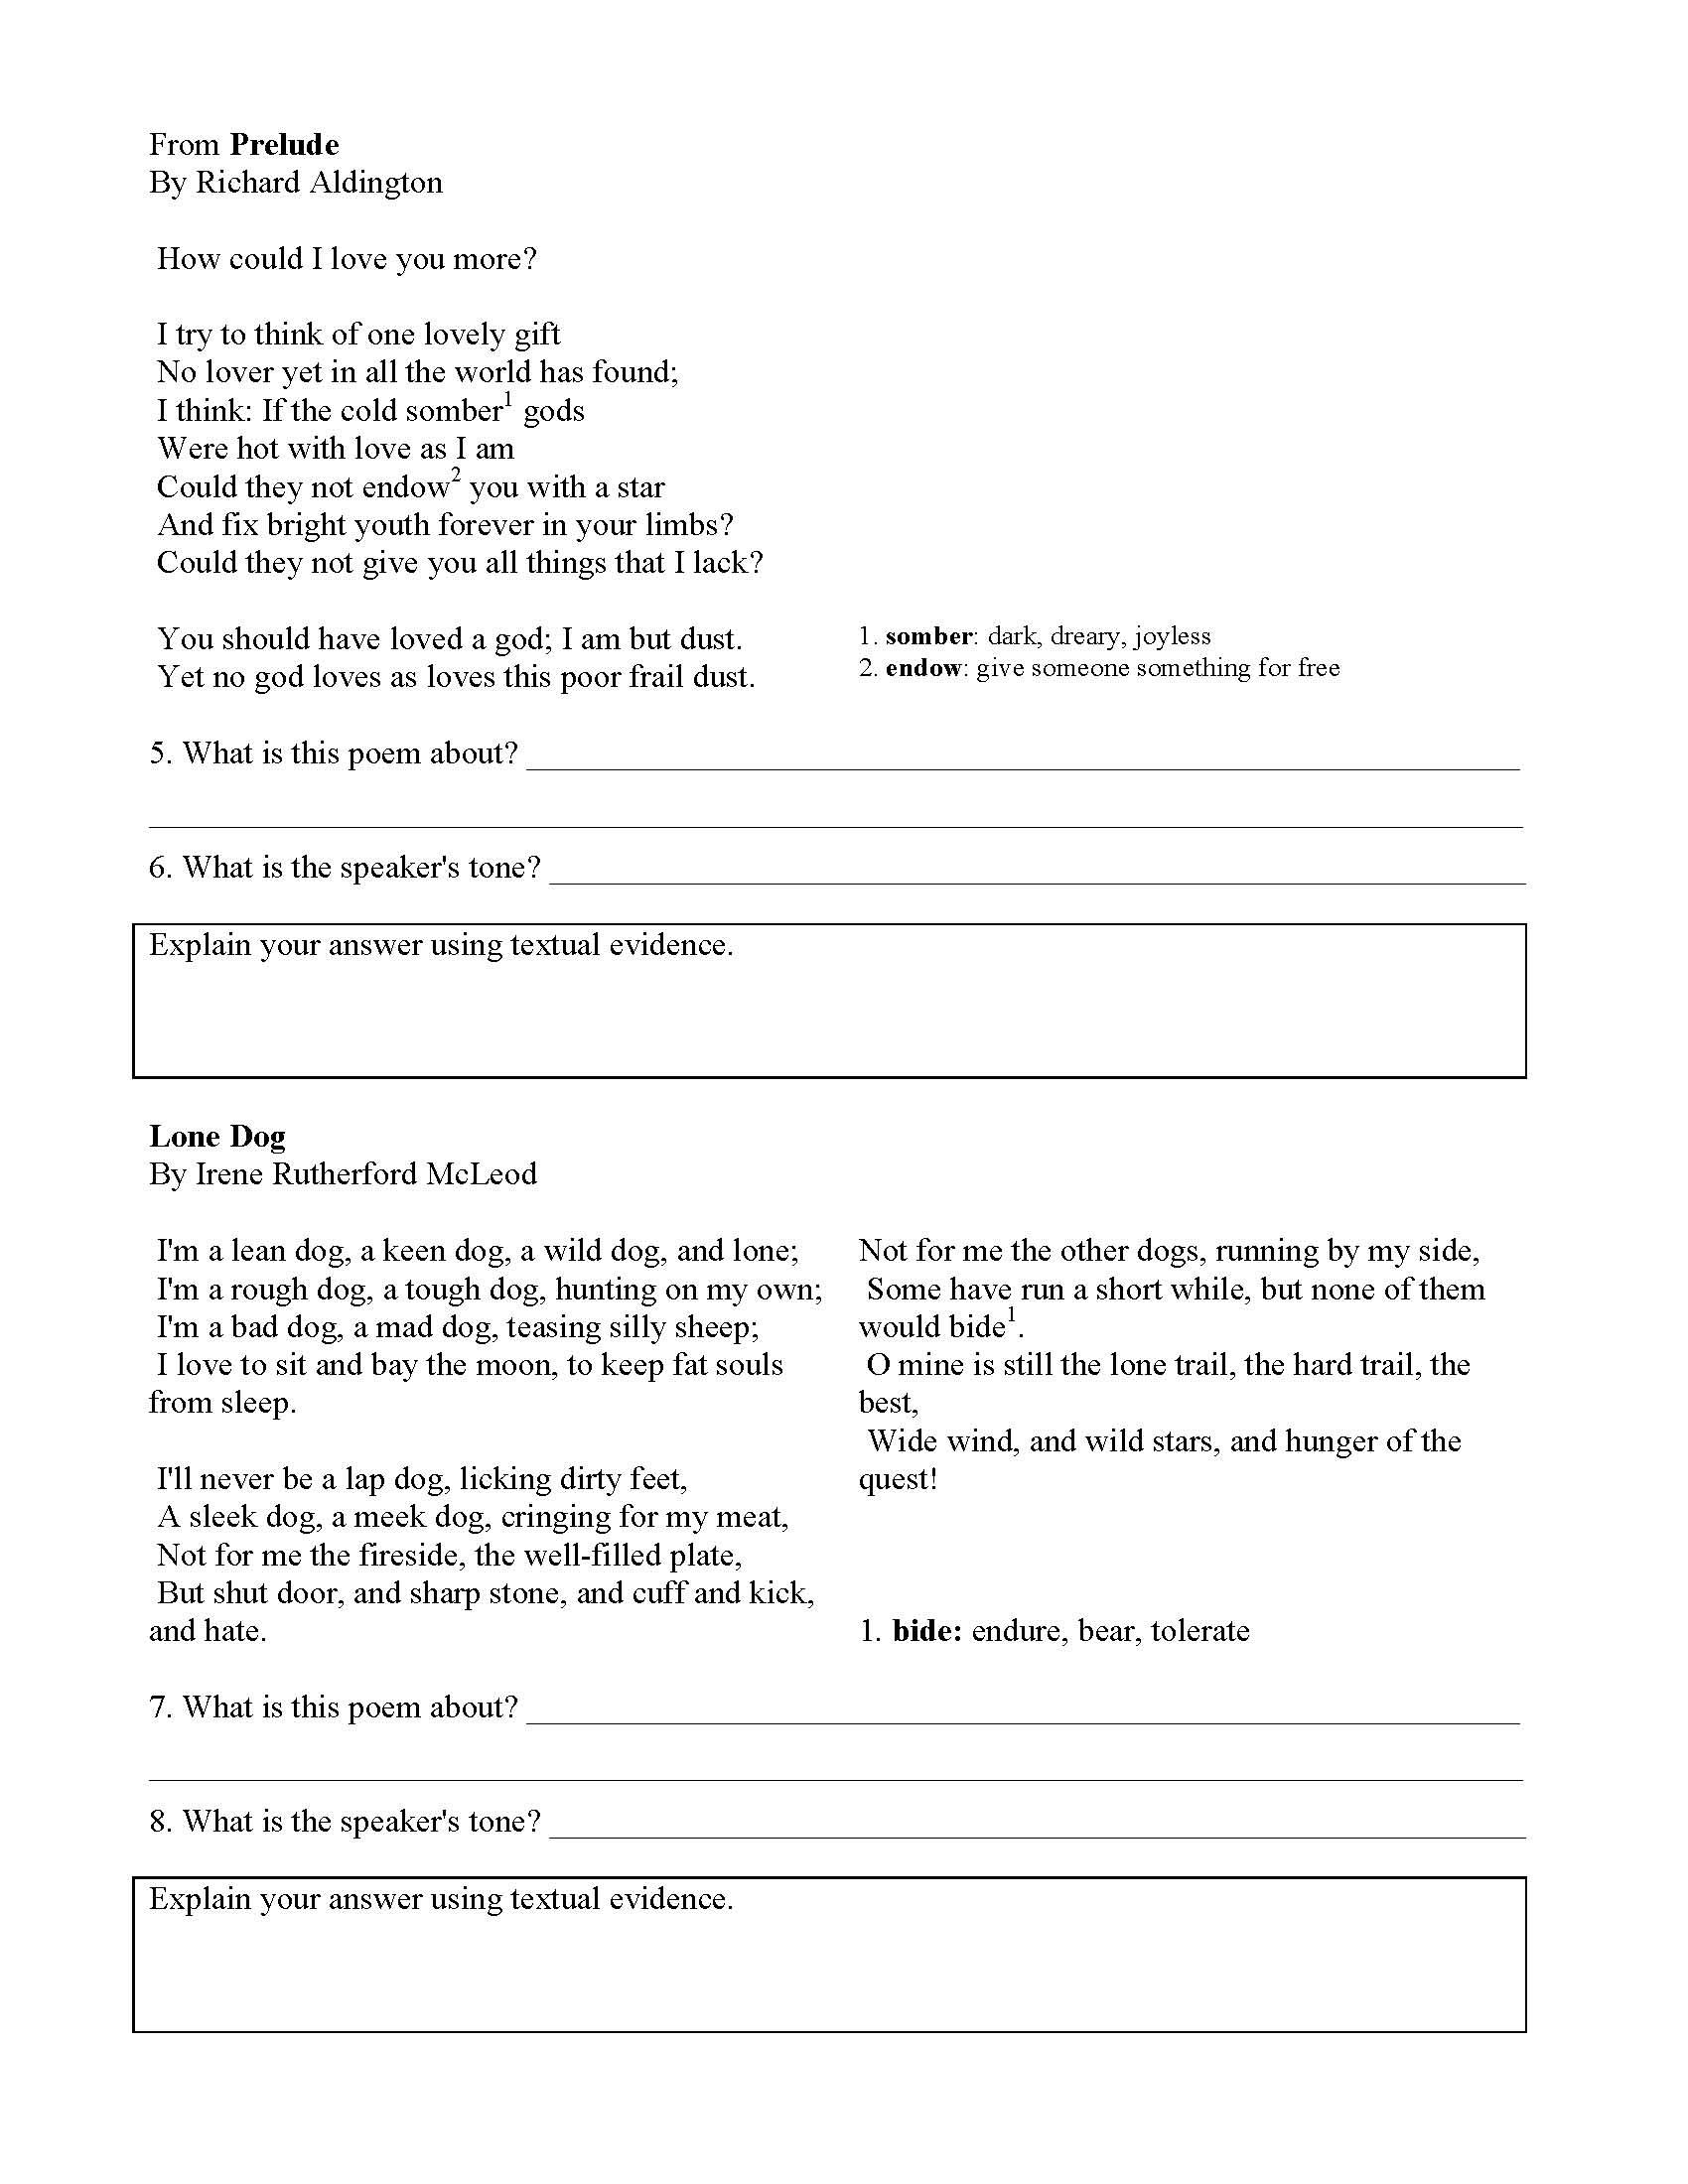 Tone Worksheet 3